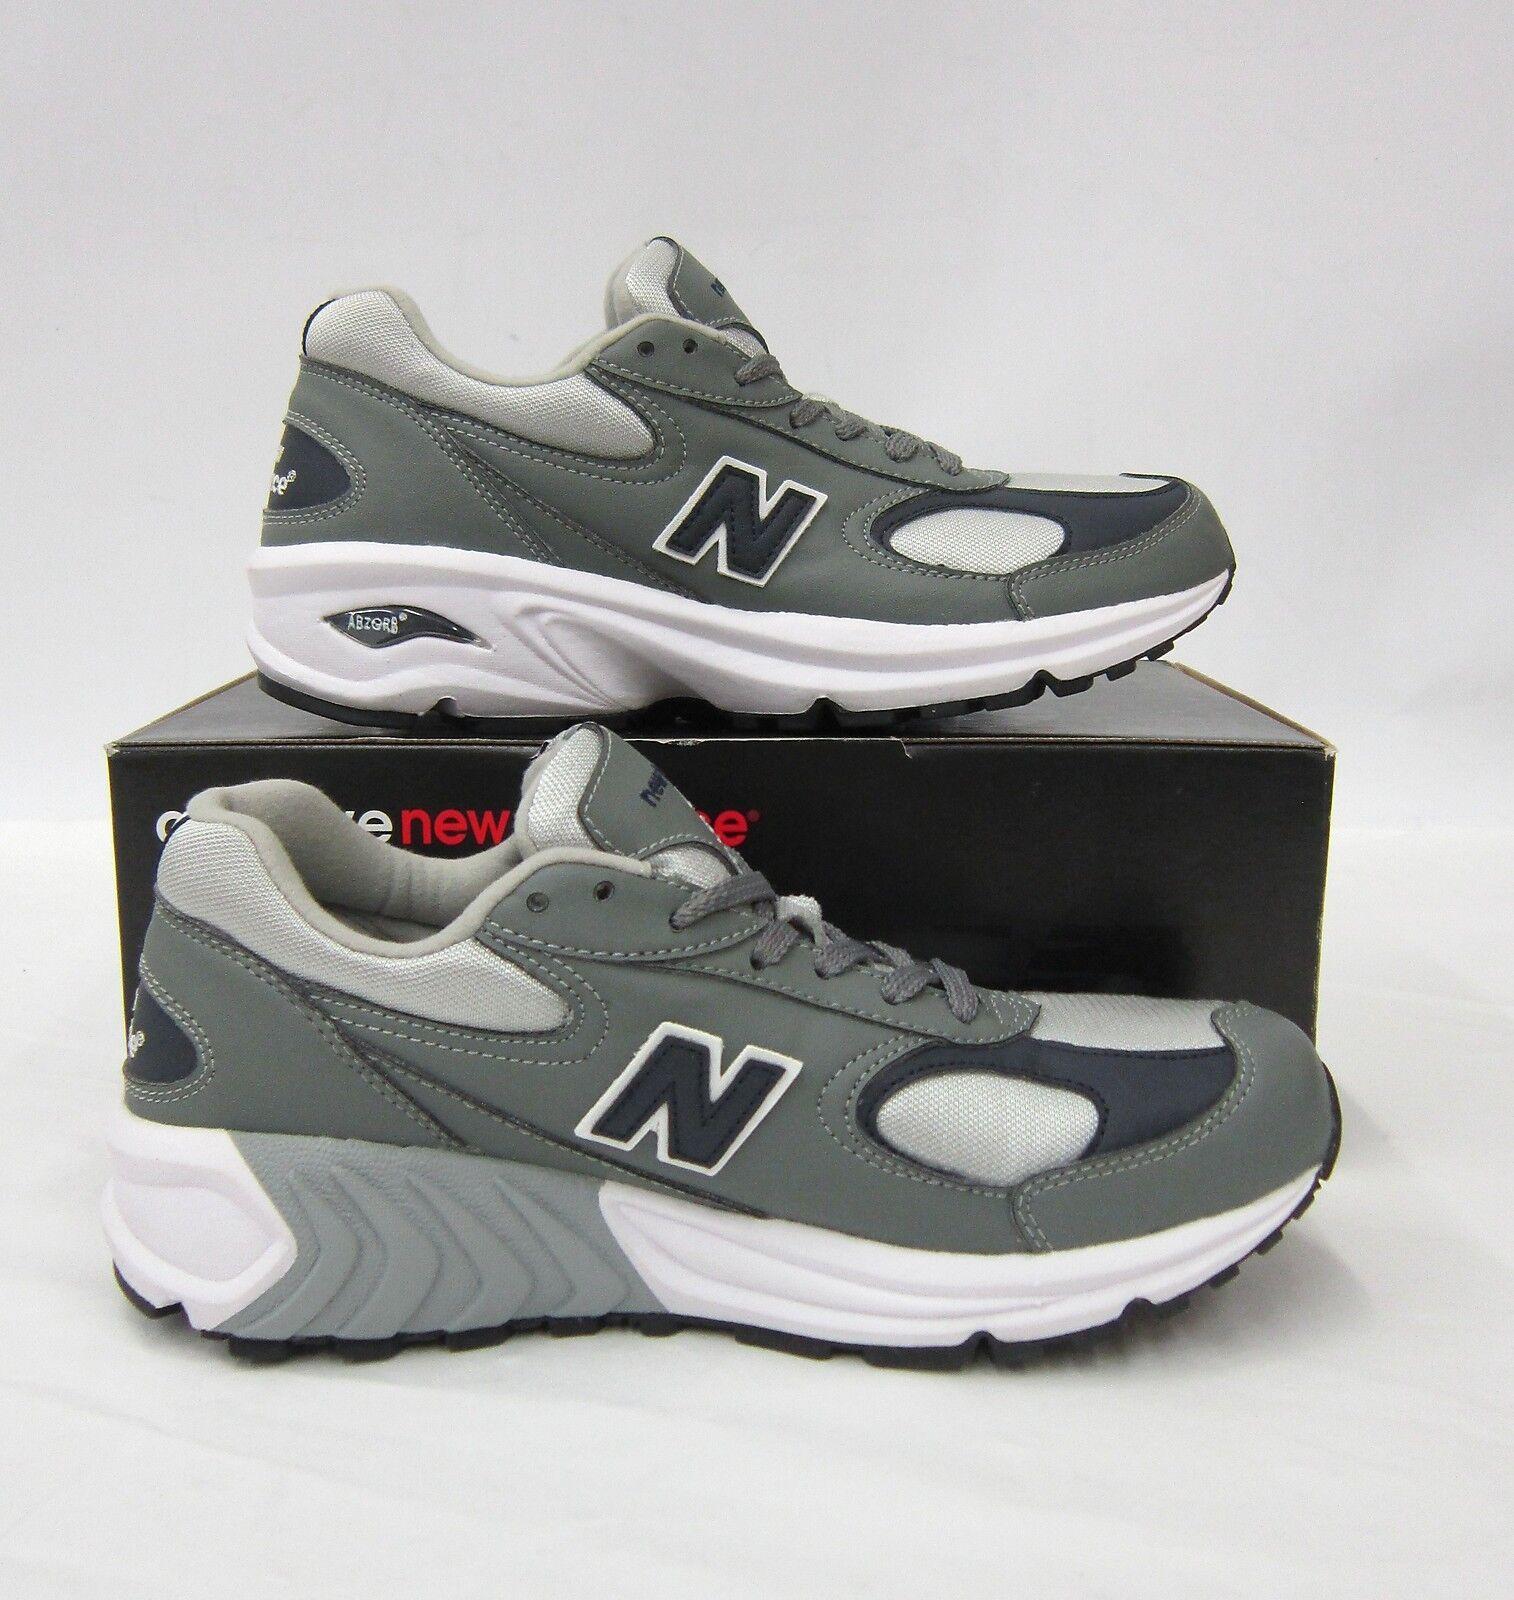 New Balance Laufschuhe Dunkelgrau / Dunkelblau #5010